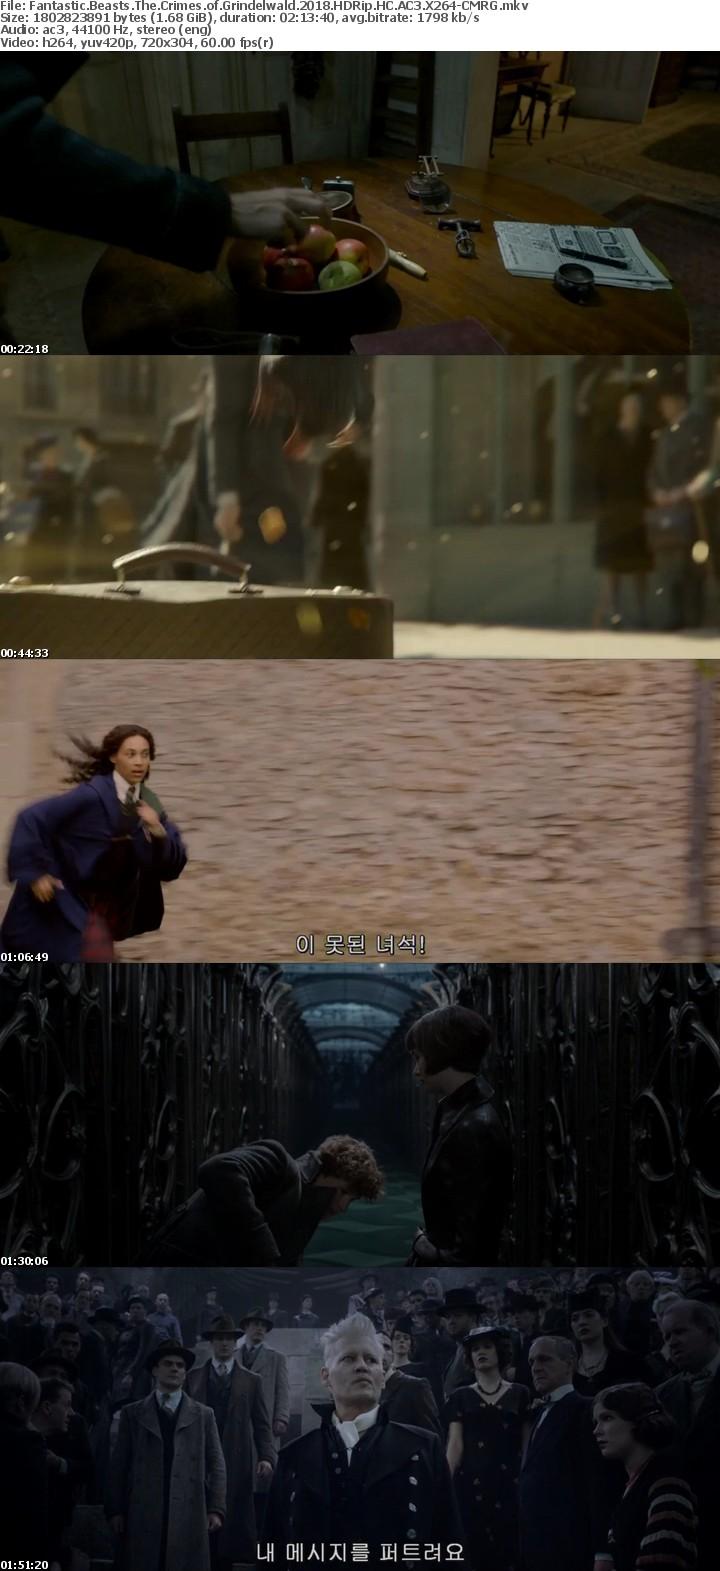 Fantastic Beasts The Crimes of Grindelwald 2018 HDRip HC AC3 X264-CMRG[TGx]